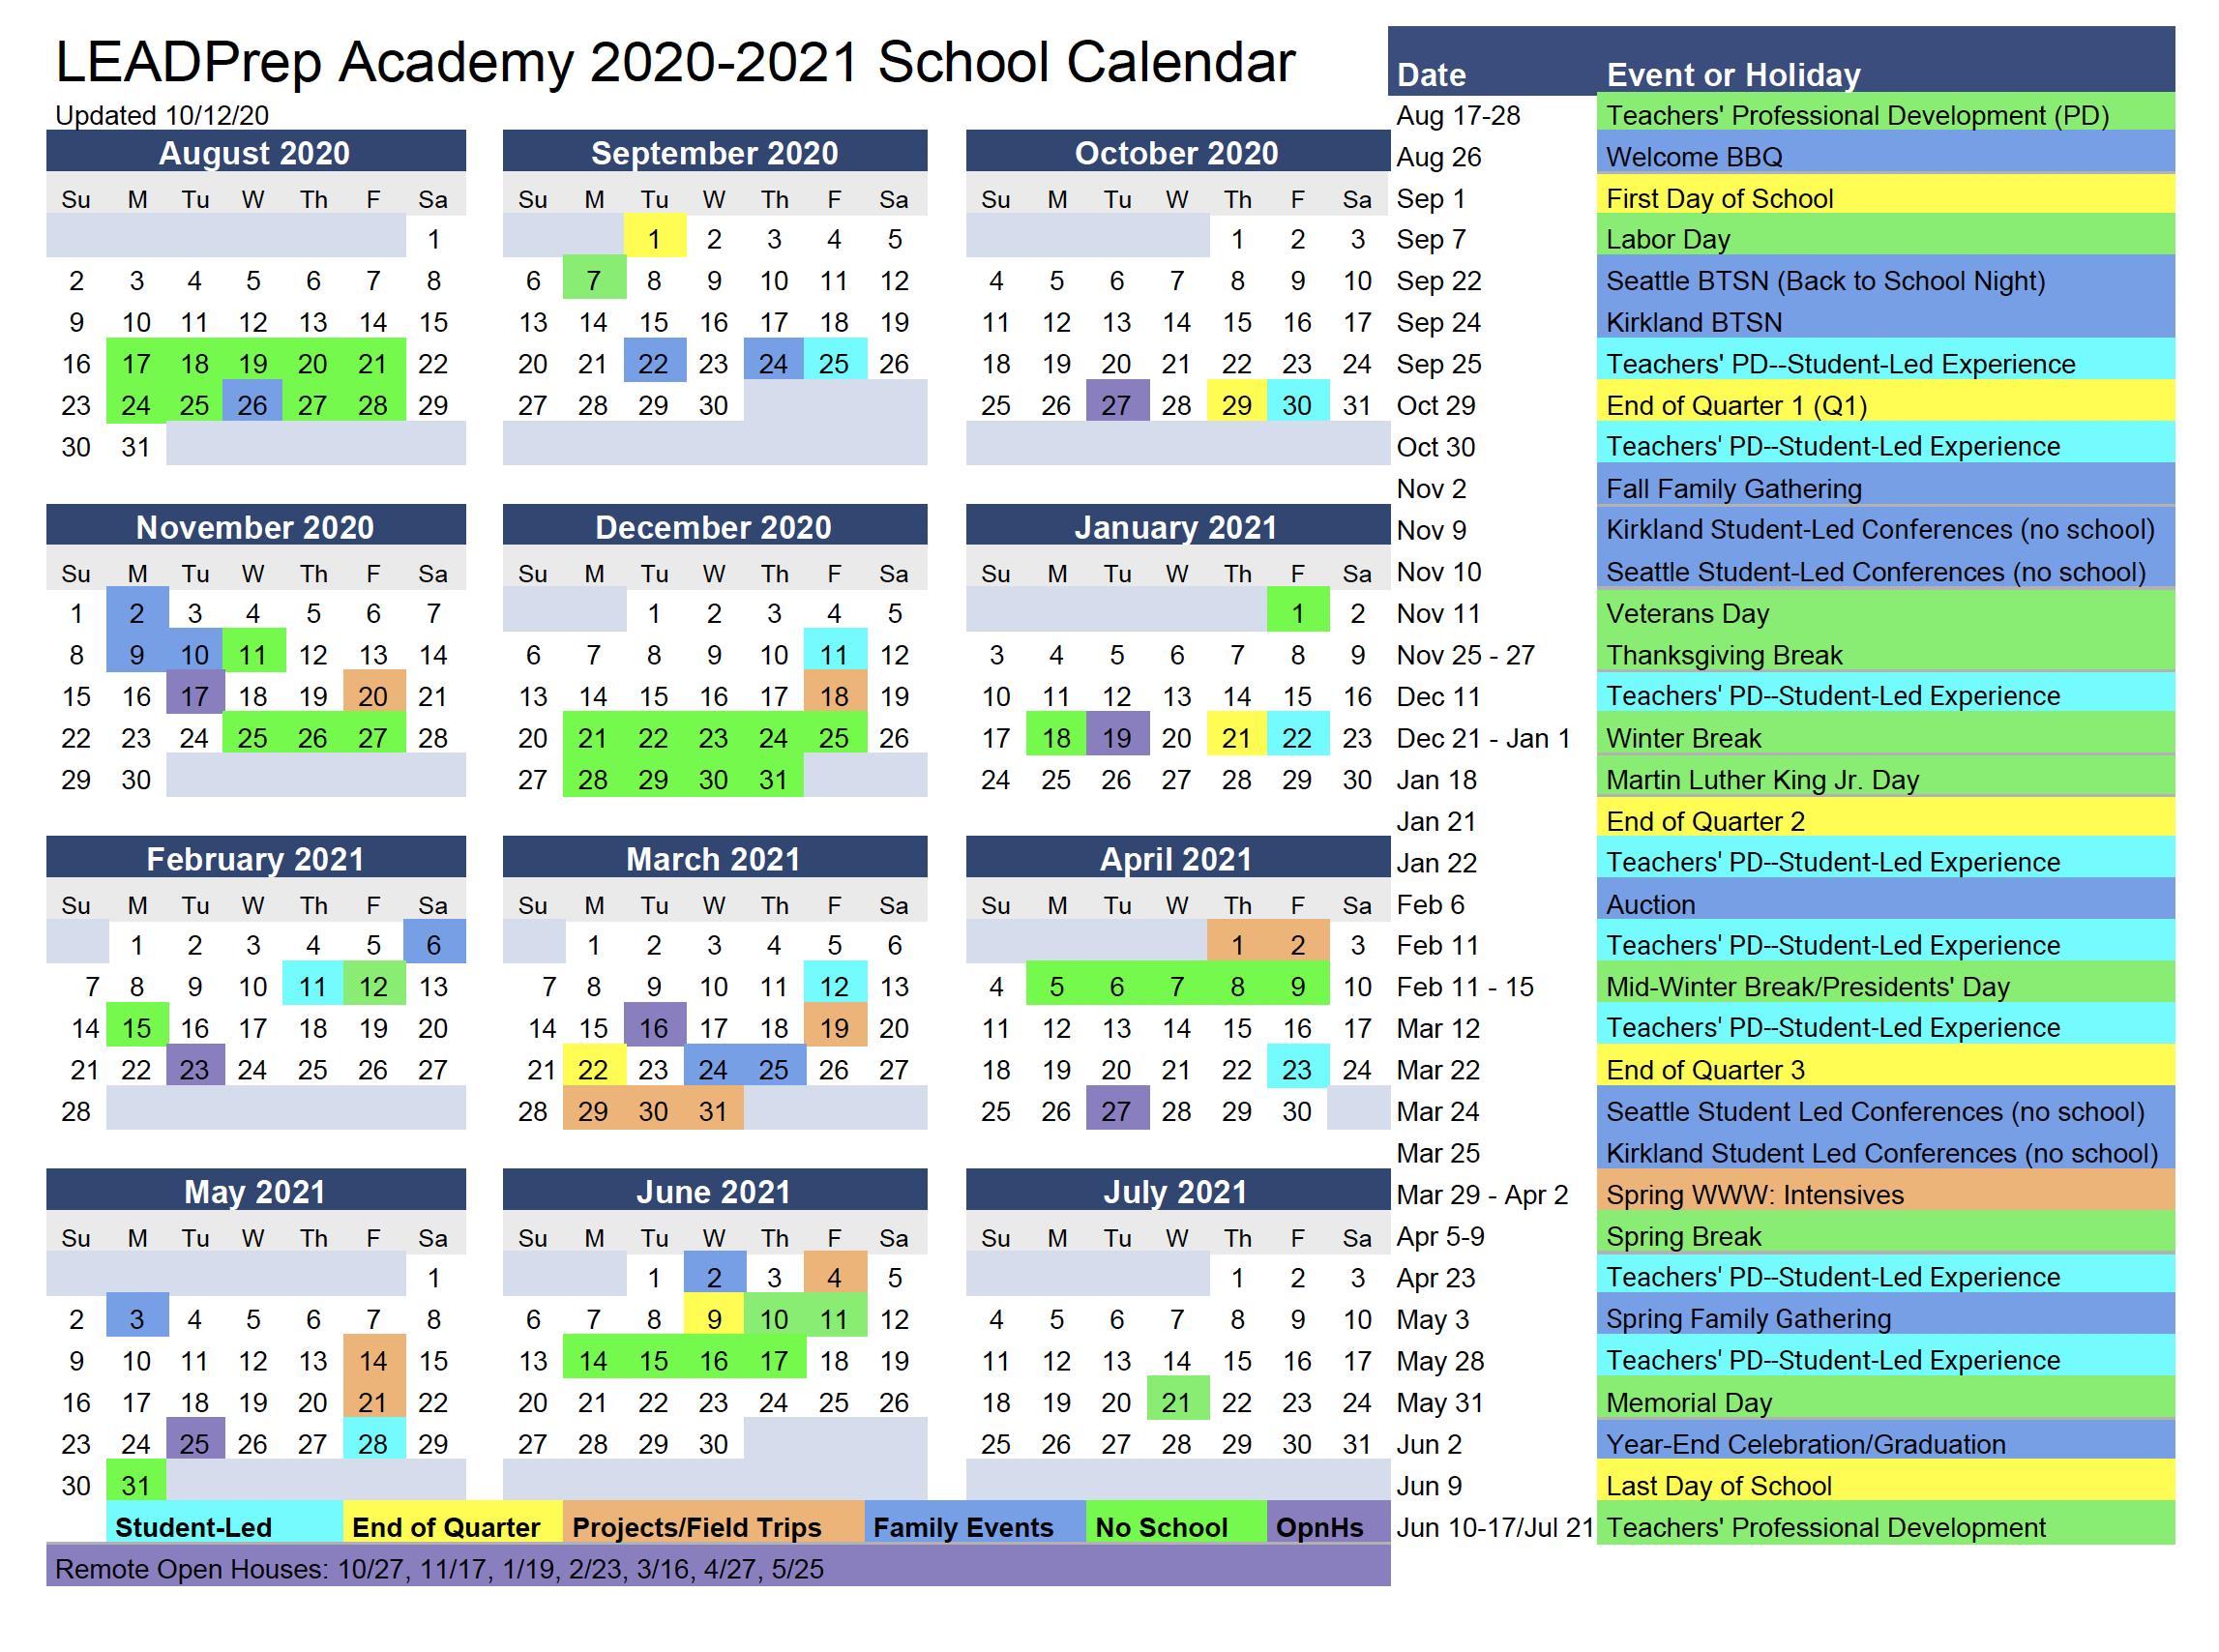 LEADPrep 2020-21 Calendar